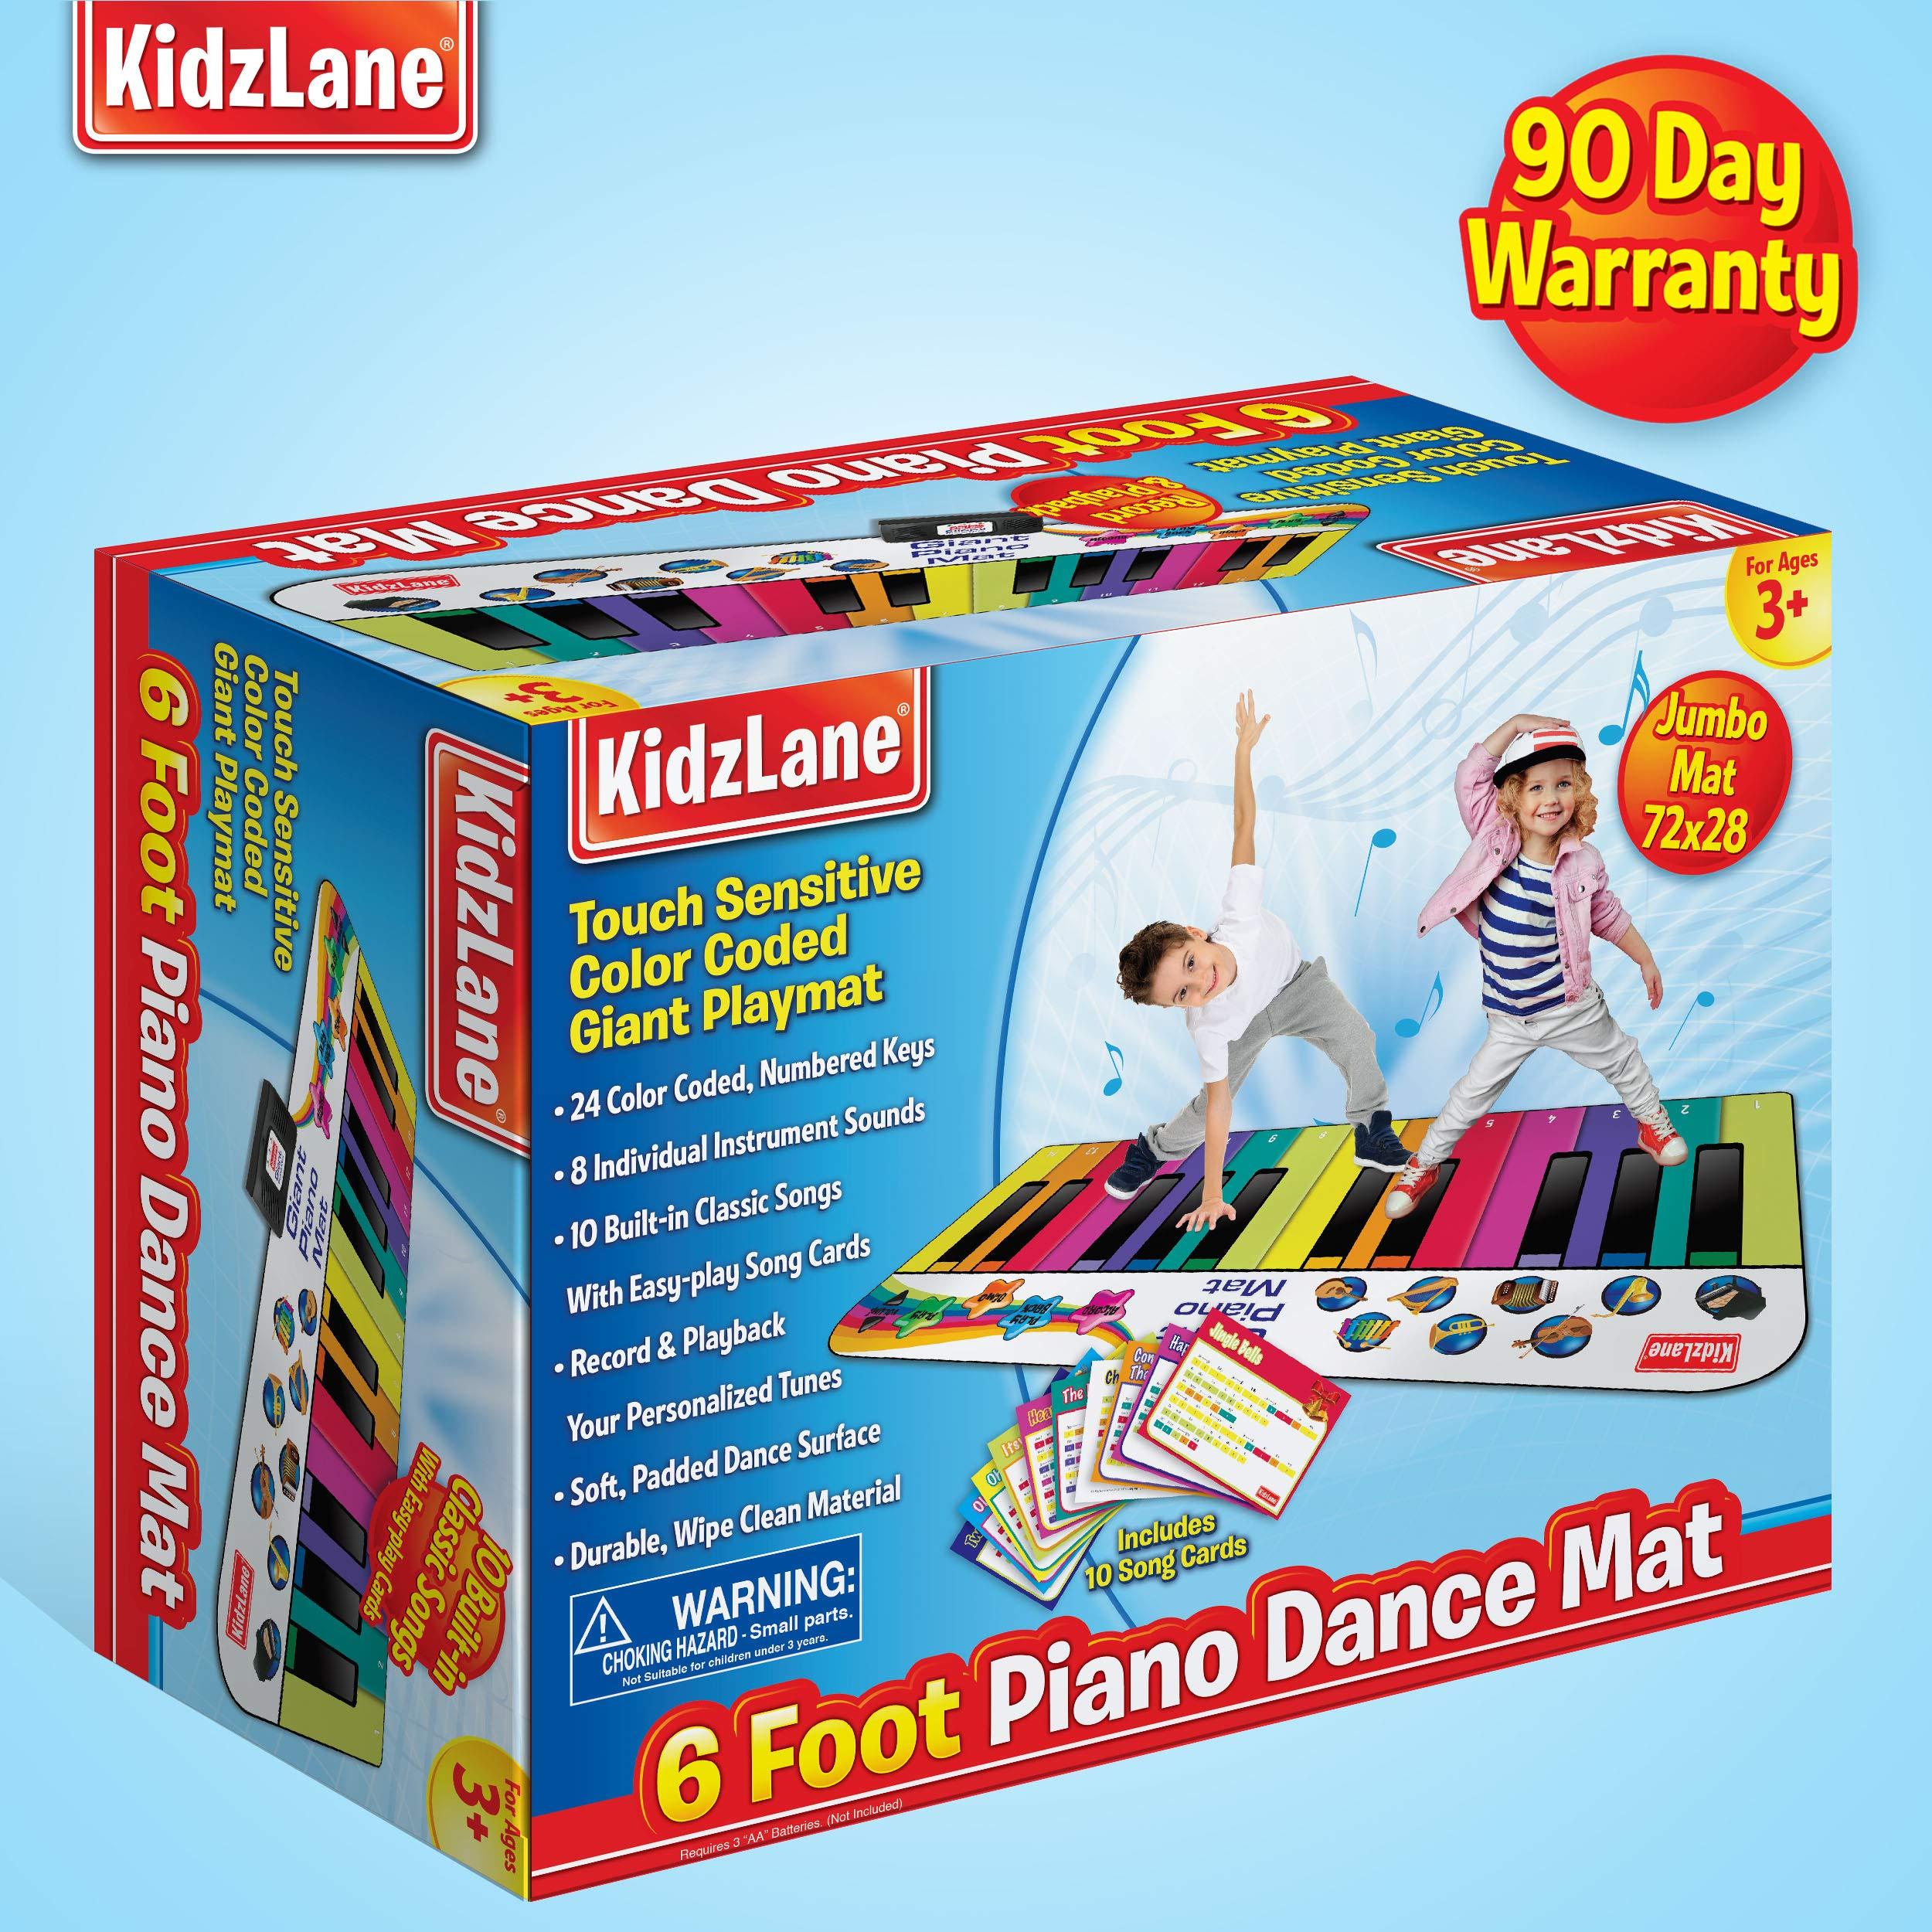 Kidzlane Floor Piano Mat: Jumbo 6 Foot Musical Keyboard Playmat for Toddlers and Kids by Kidzlane (Image #6)